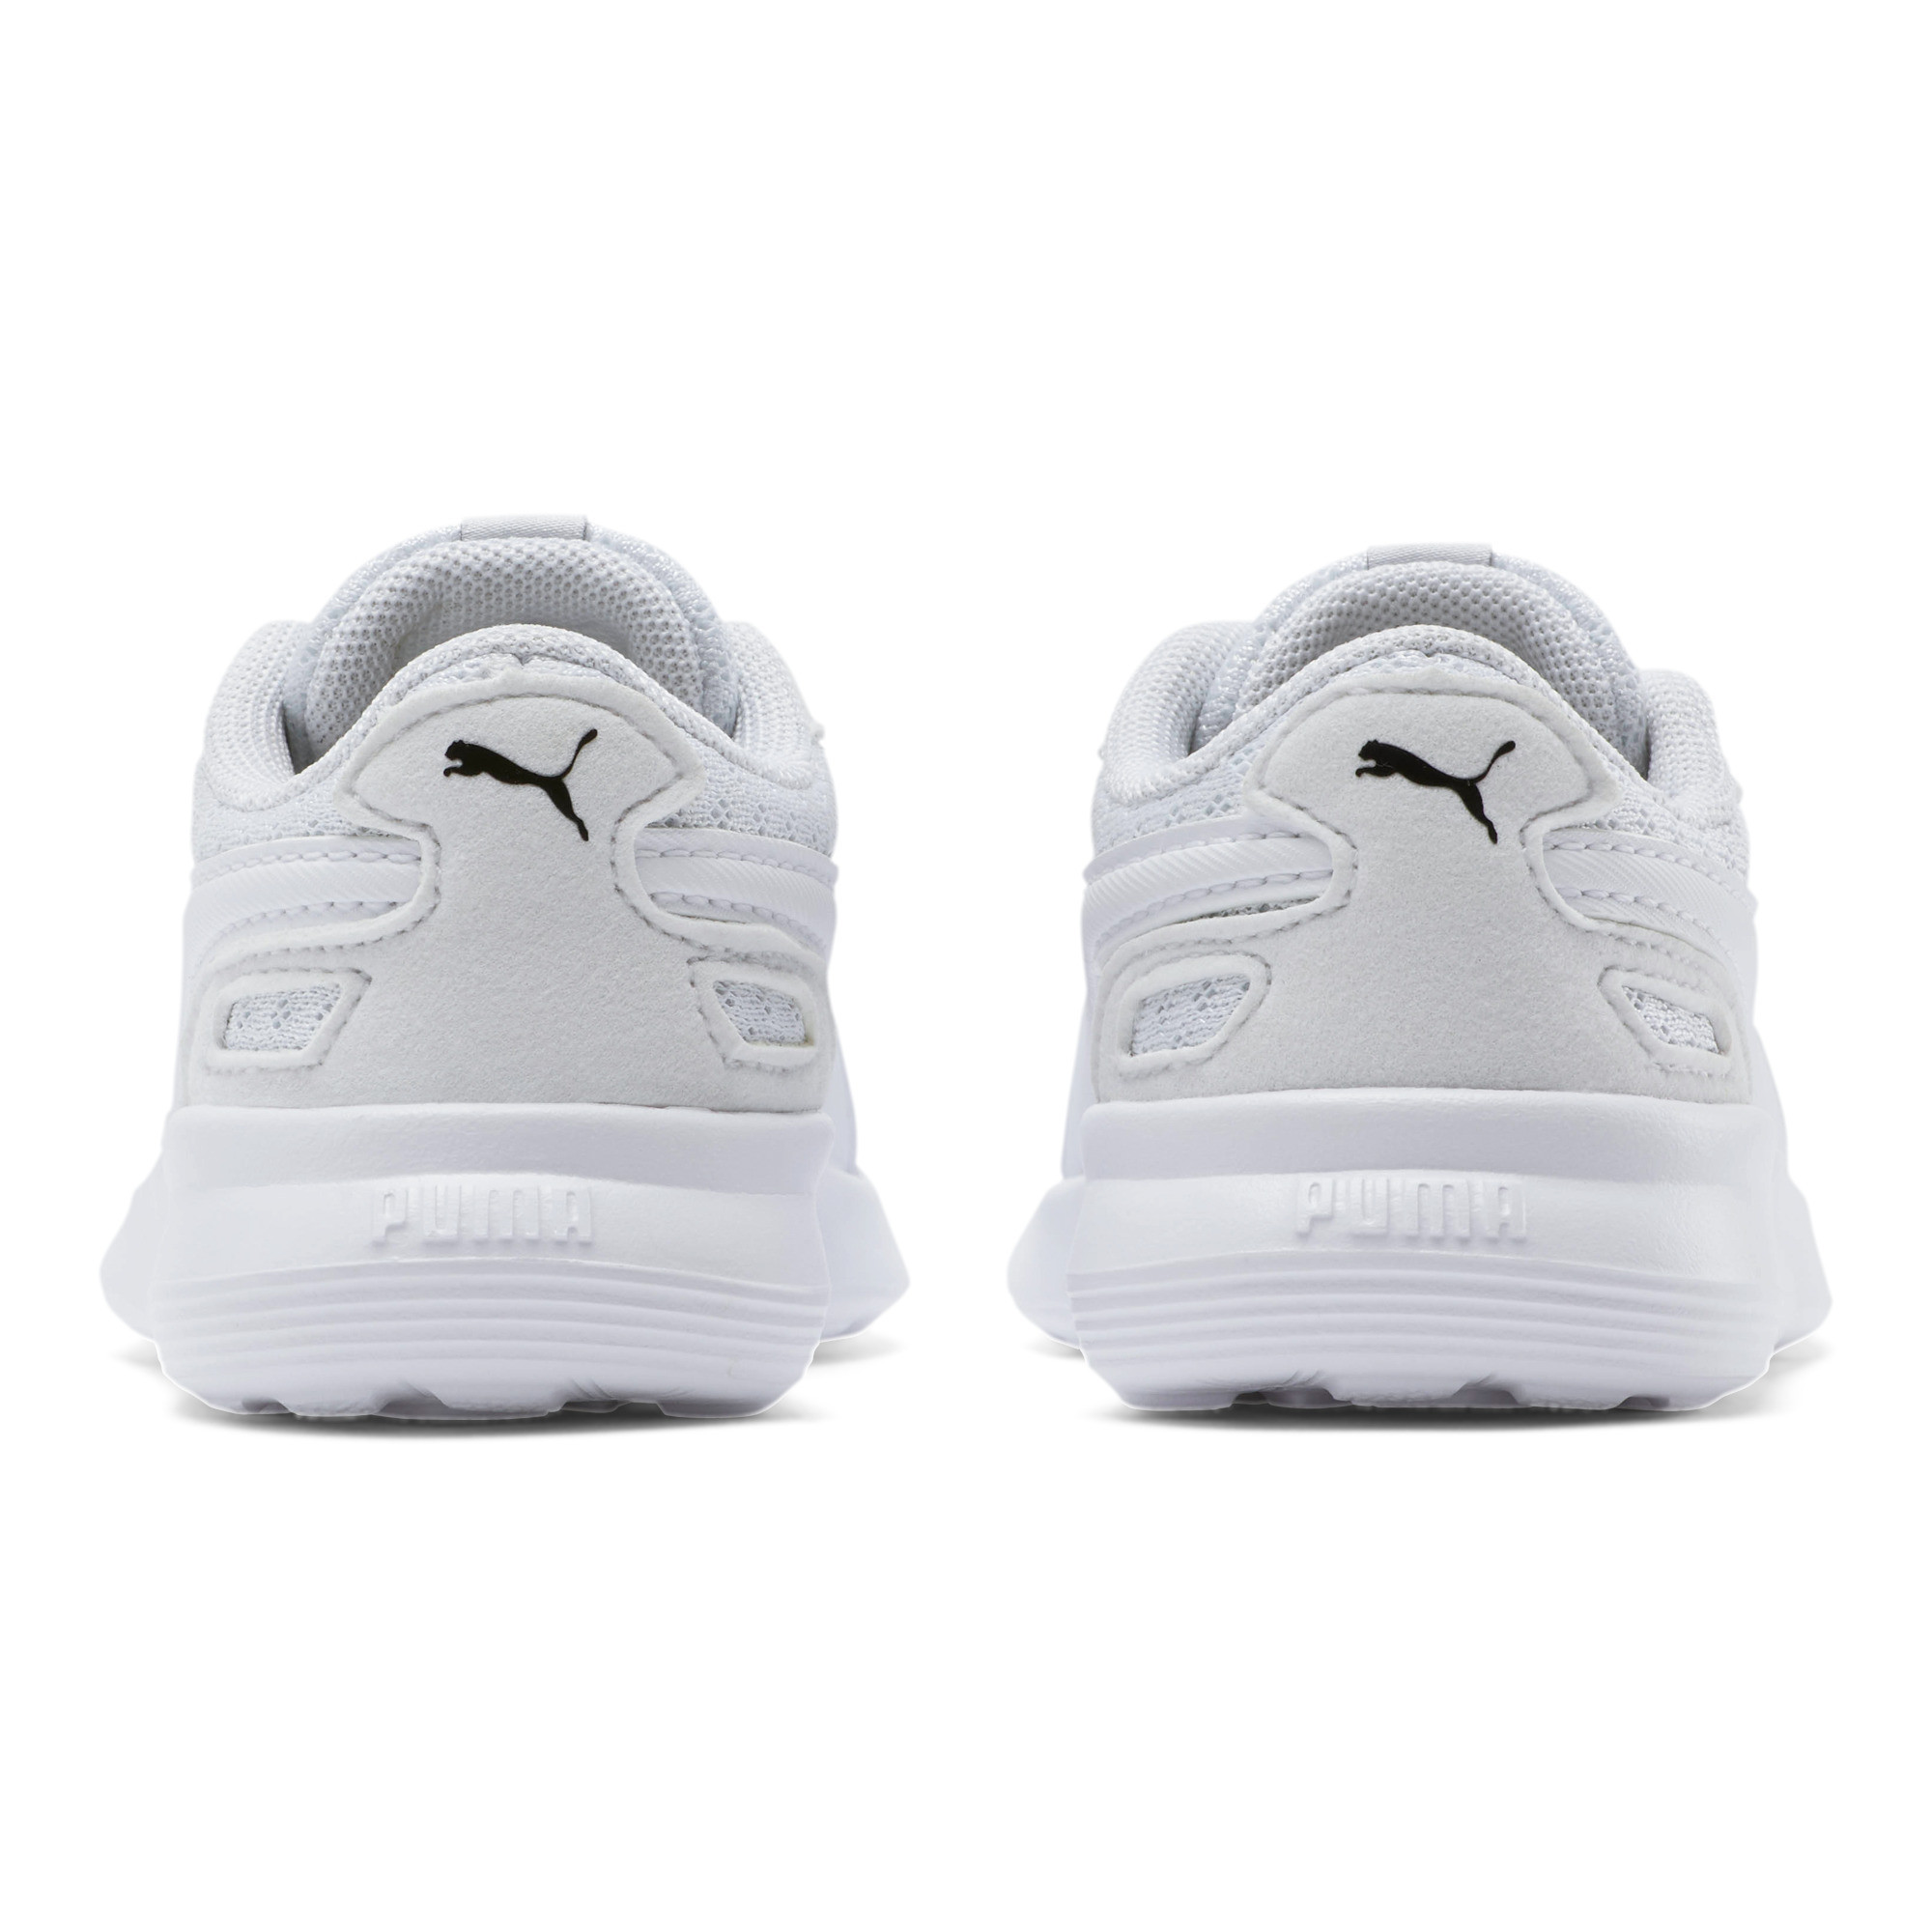 PUMA-ST-Activate-AC-Toddler-Shoes-Kids-Shoe-Kids thumbnail 6